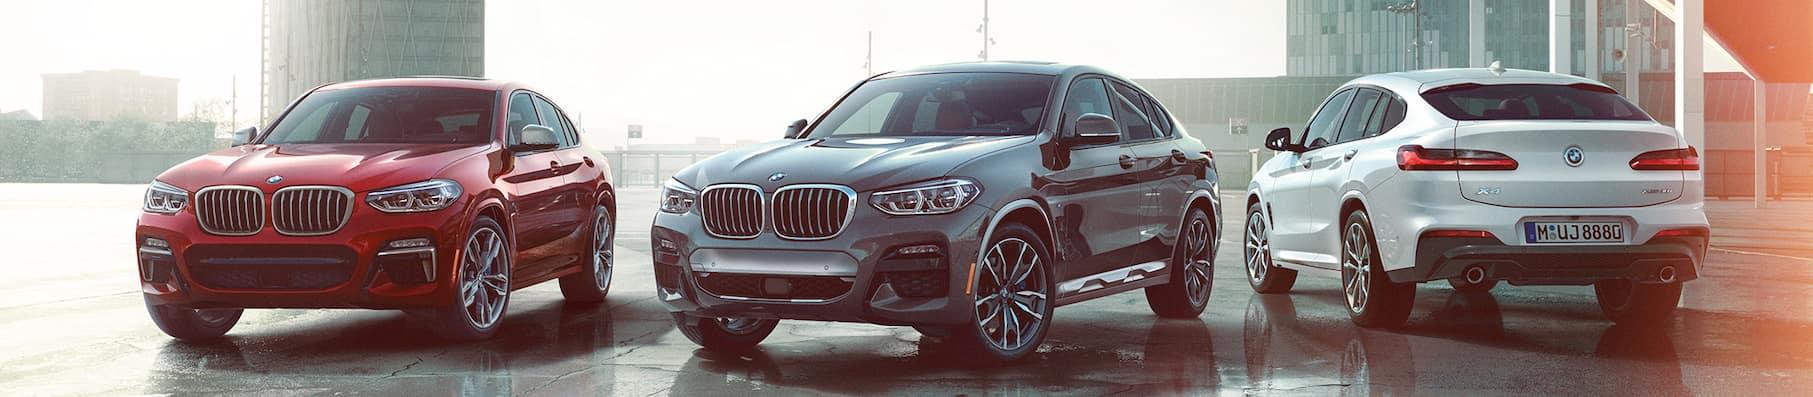 BMW X4 Multi Vehicle